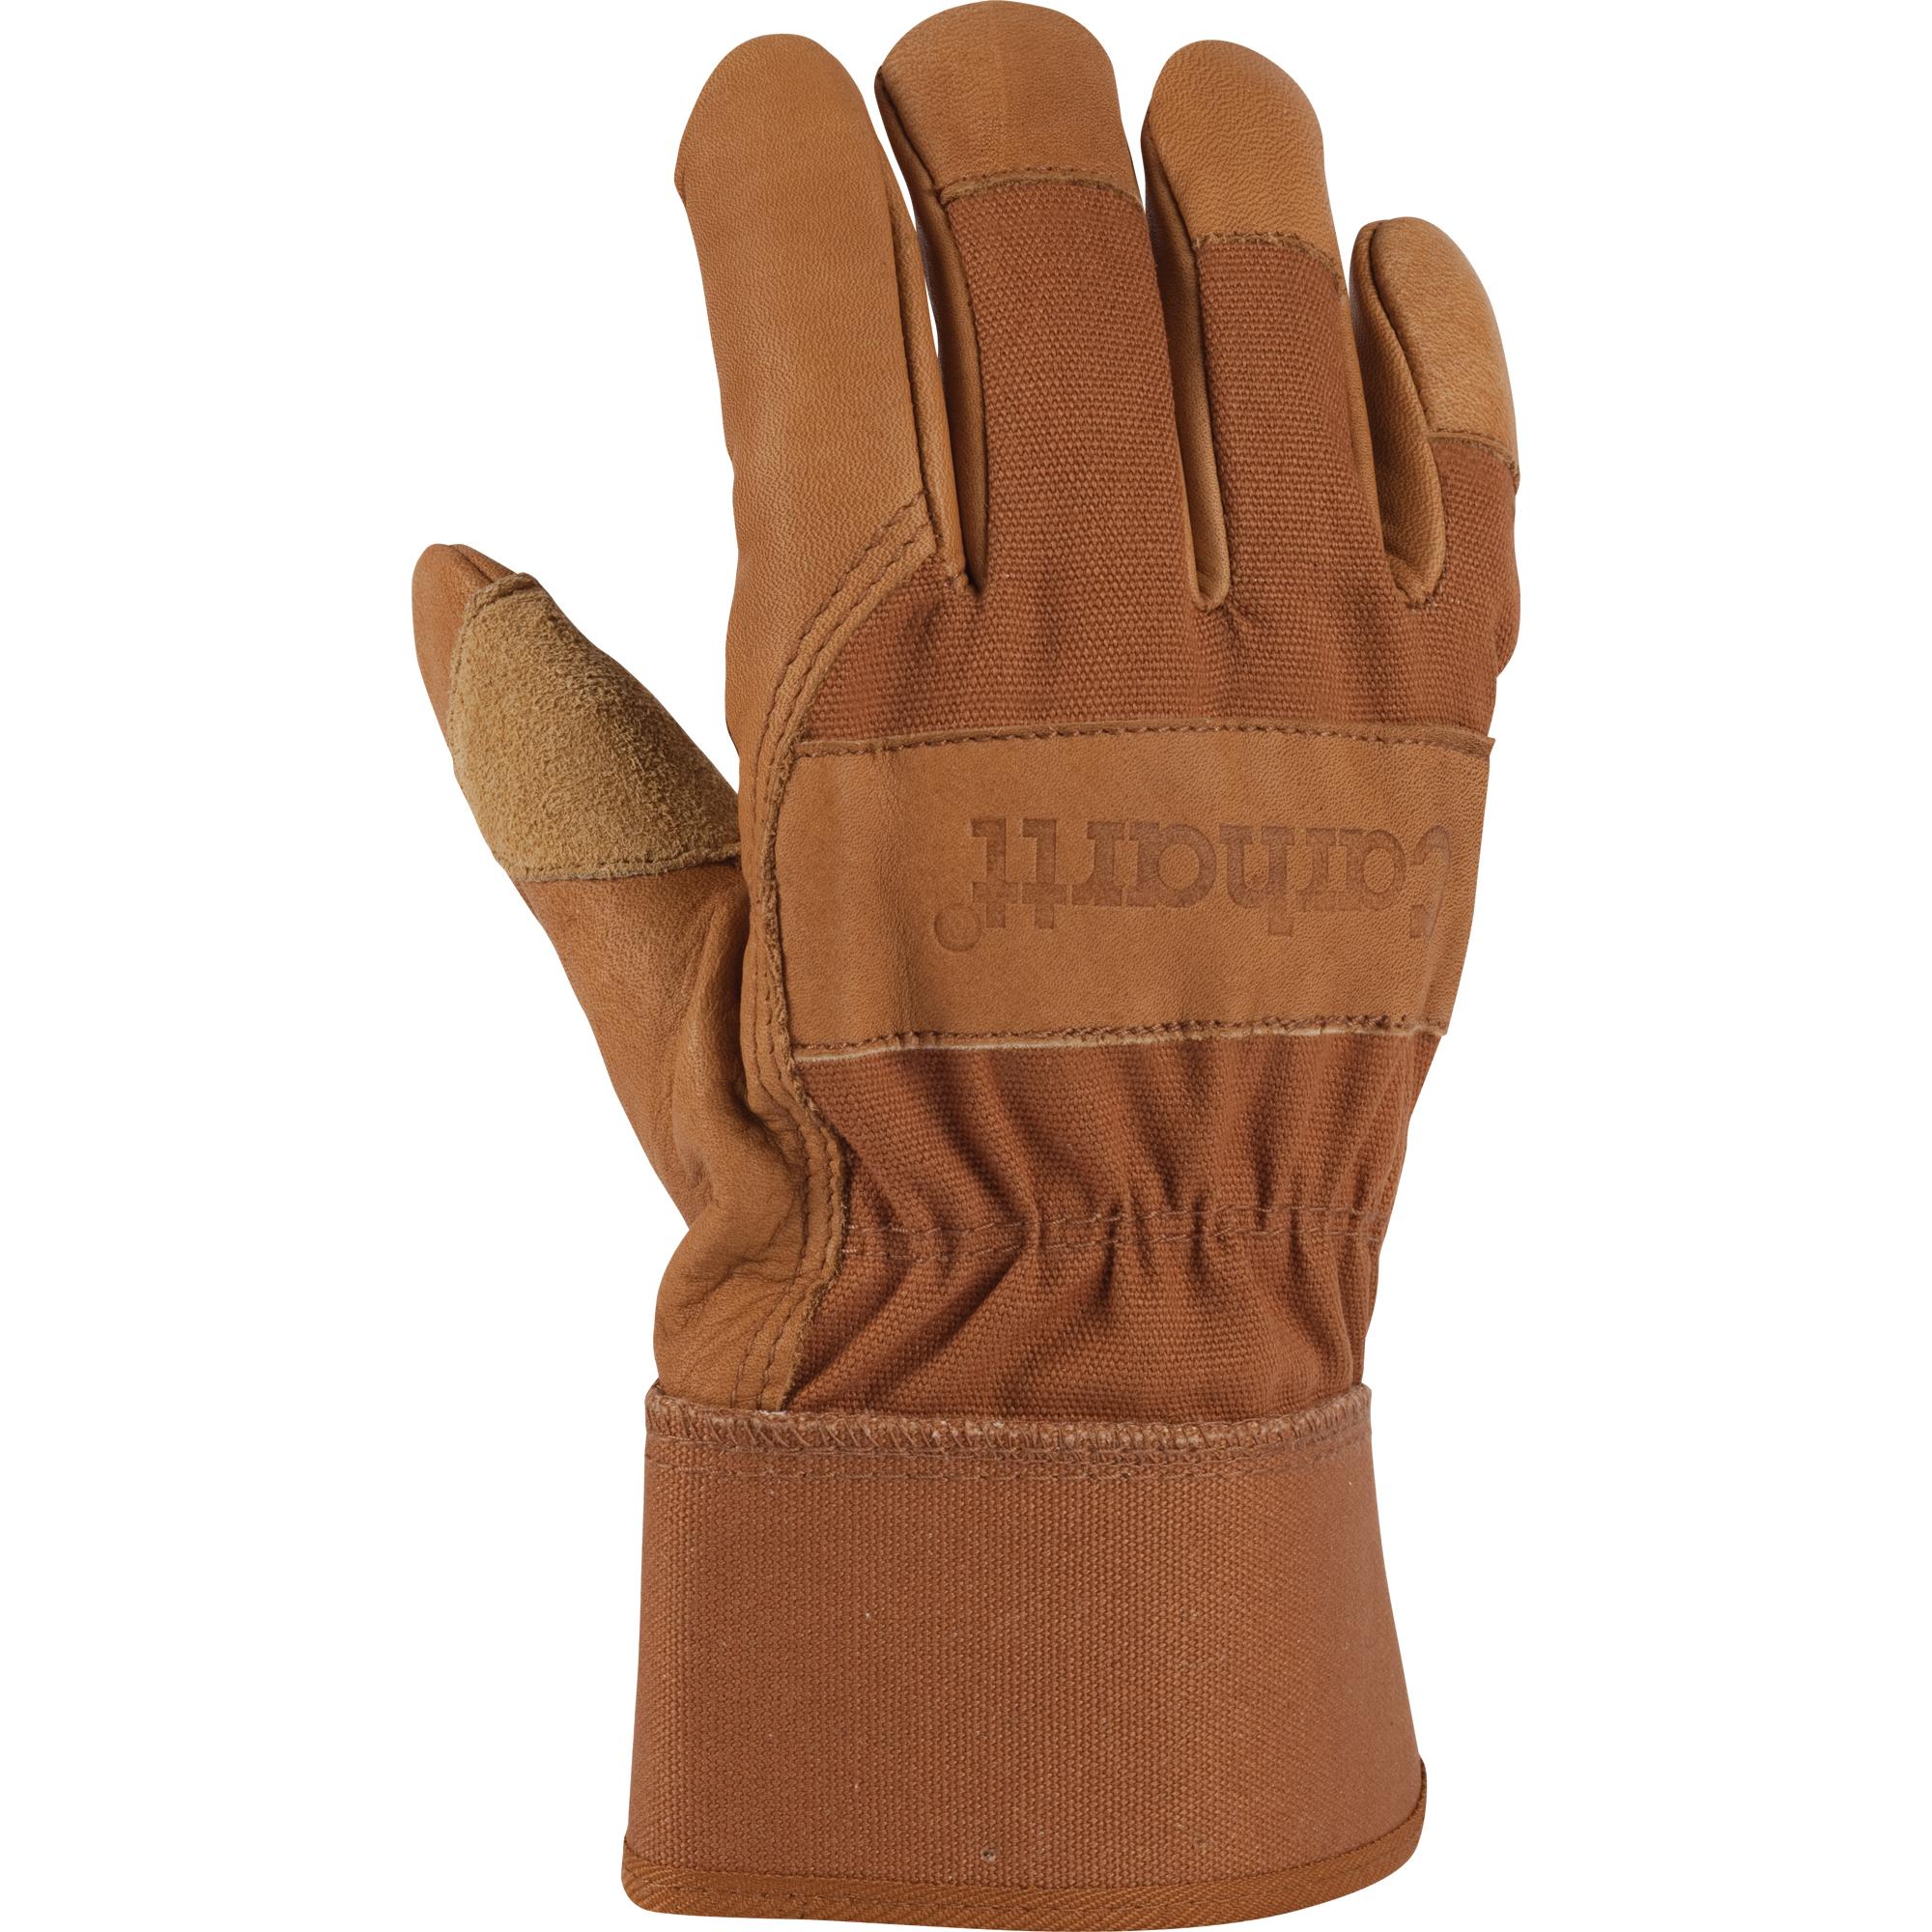 Leather palm work gloves wholesale - Grain Leather Work Glove Safety Cuff